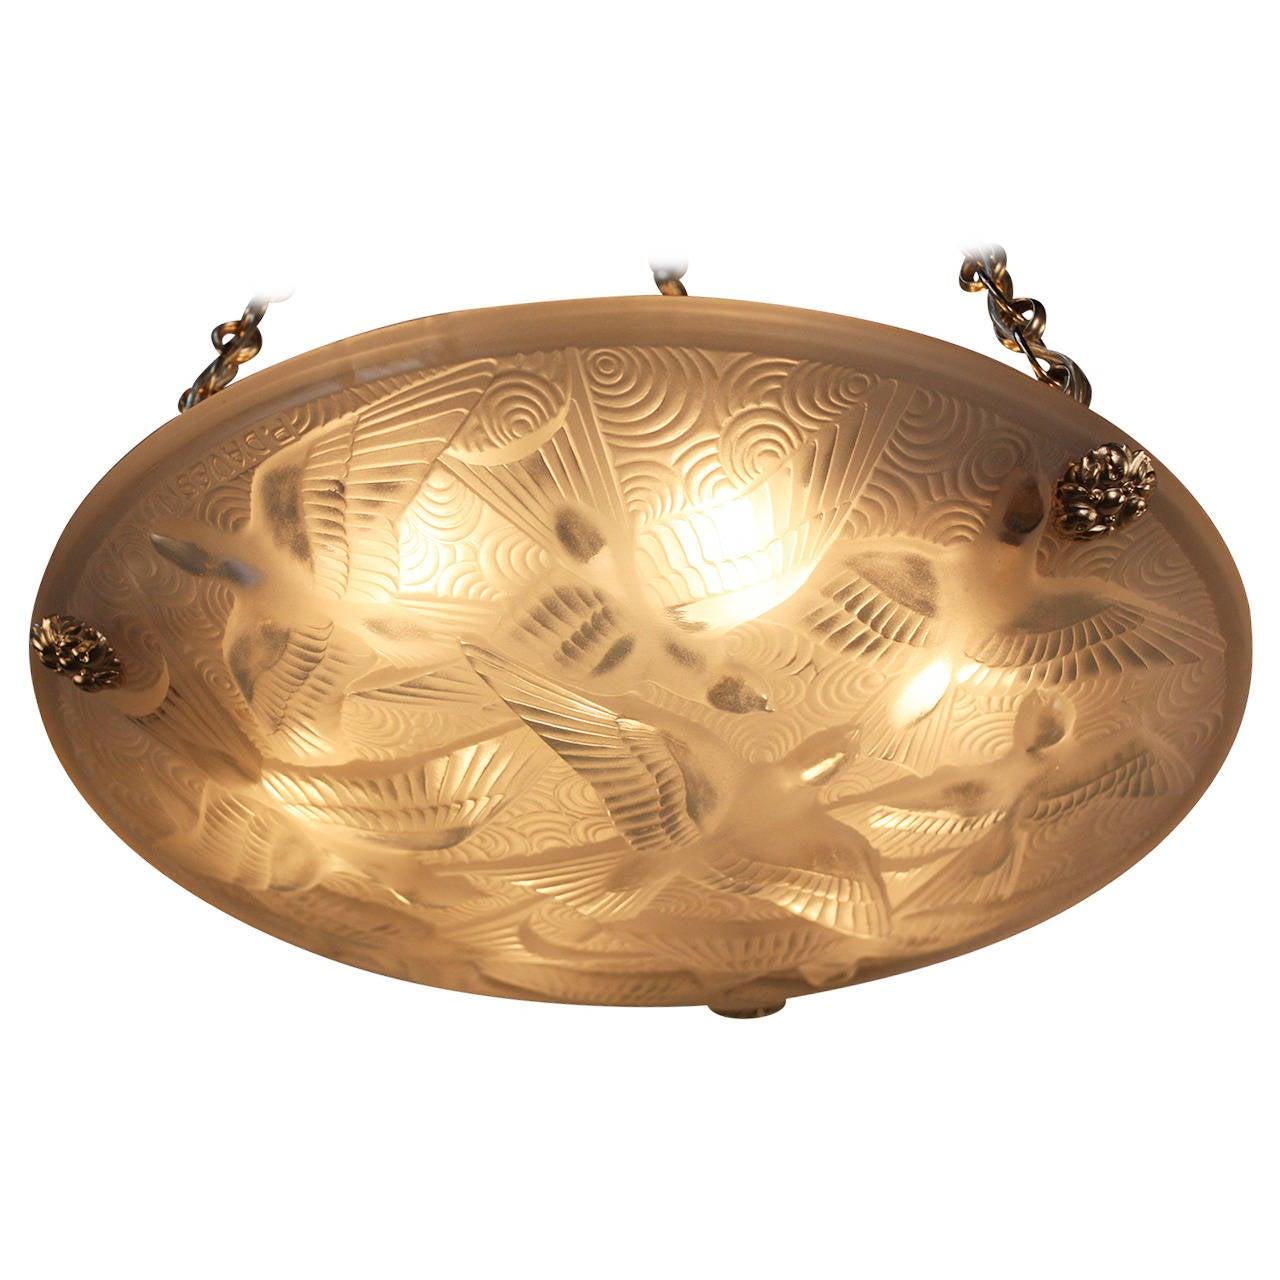 Elk Lighting Pierre: Wonderful Art Deco Chandelier By Pierre D'Avesn At 1stdibs